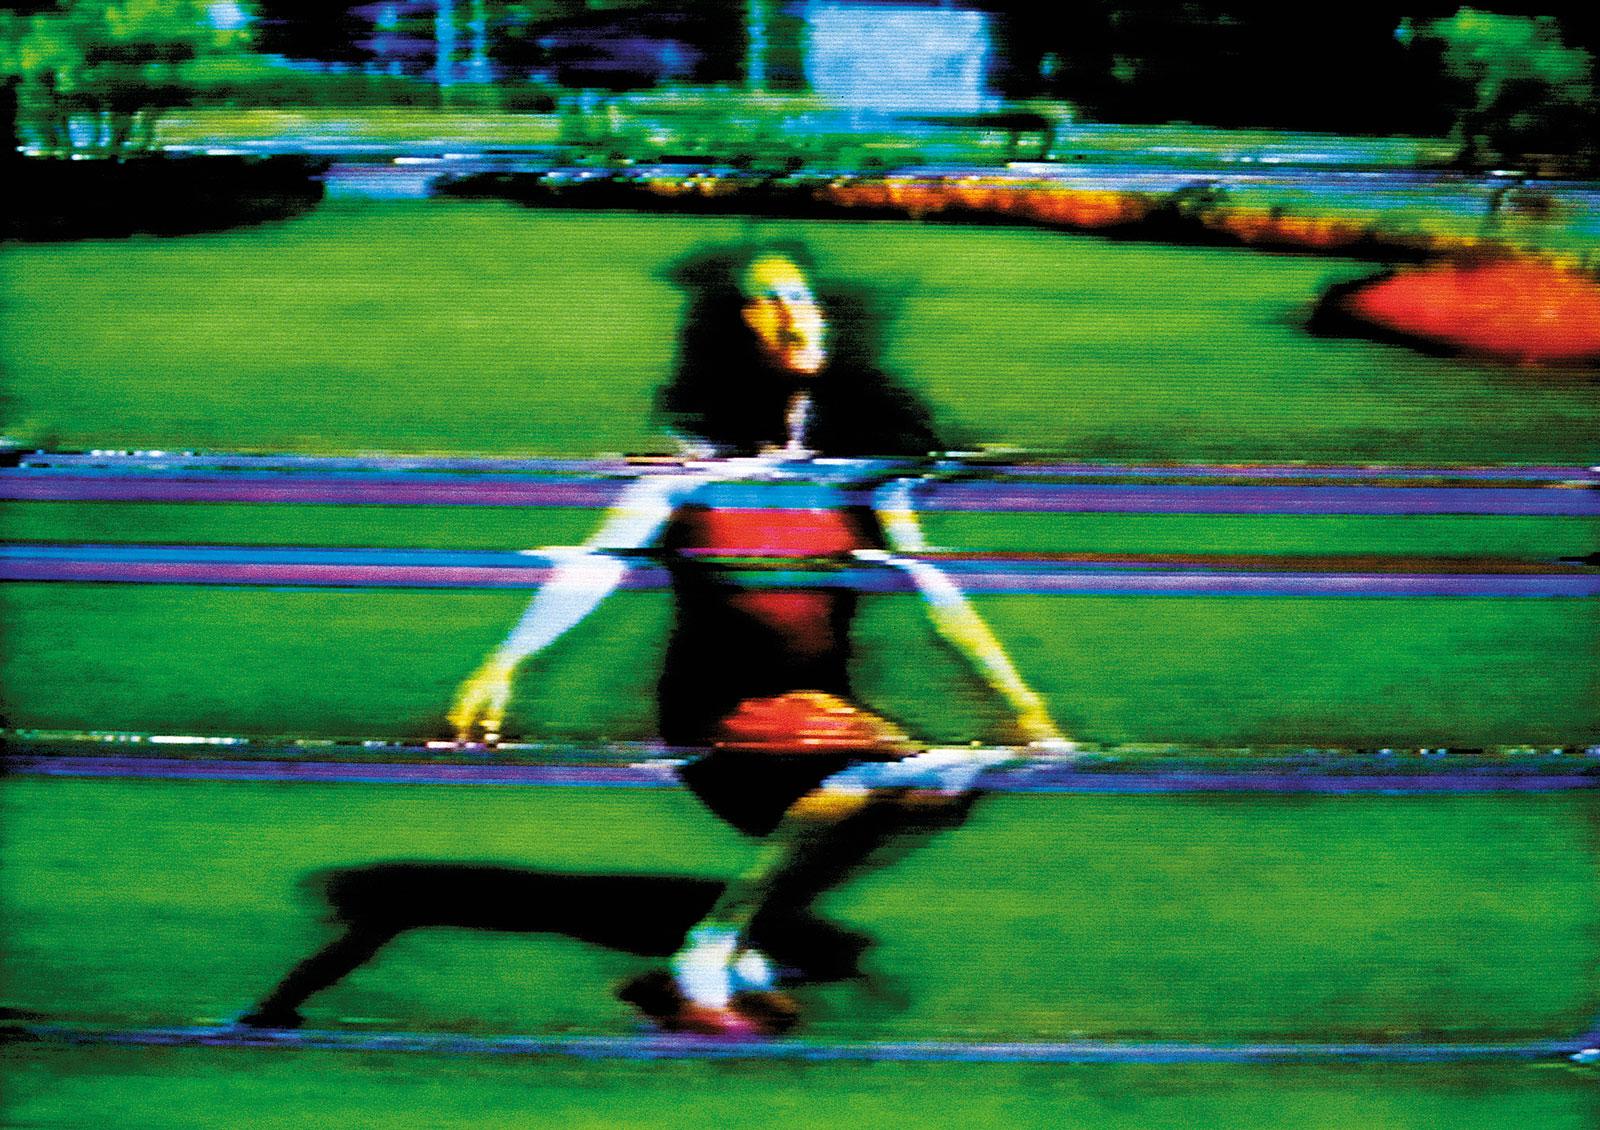 Still from Pipilotti Rist's (Absolutions) Pipilotti's Mistakes, 1988